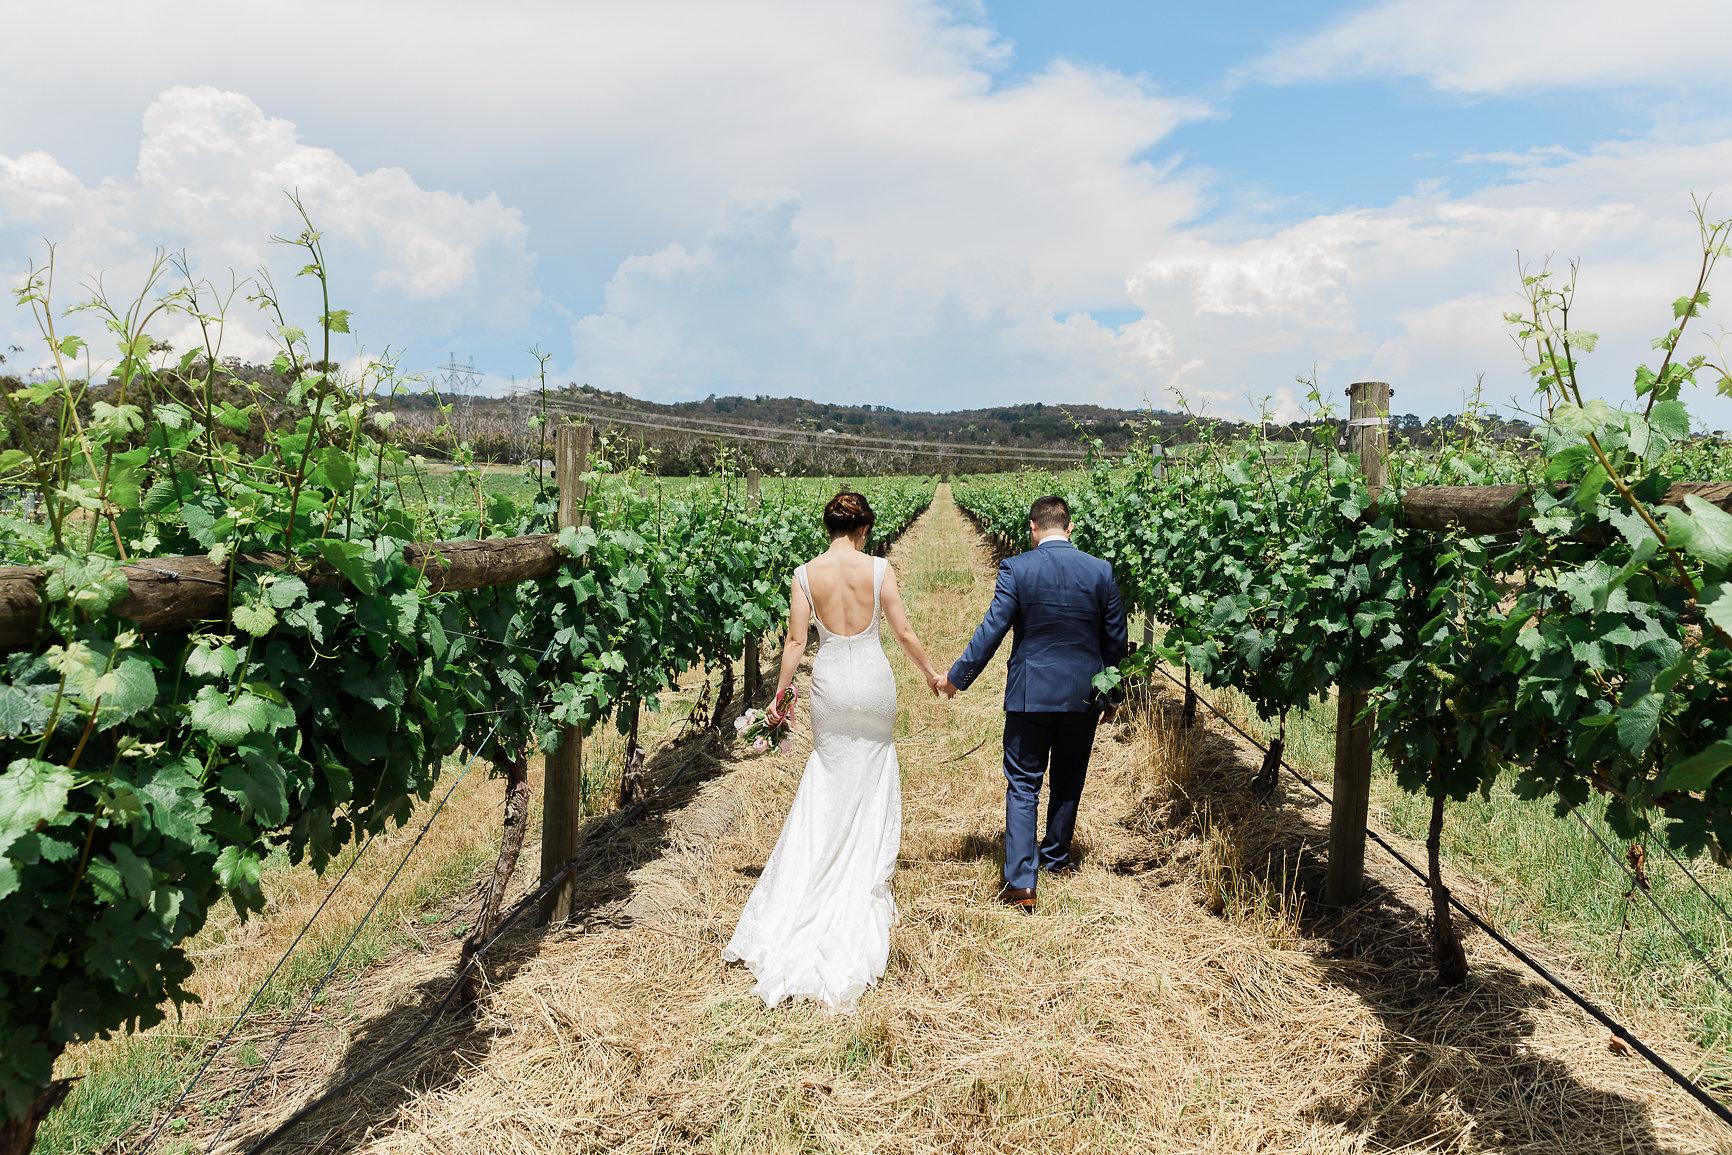 Sydney Wedding Photography Vines Helen's Hill Restaurant  St Peter and Paul's Church - 033.jpg